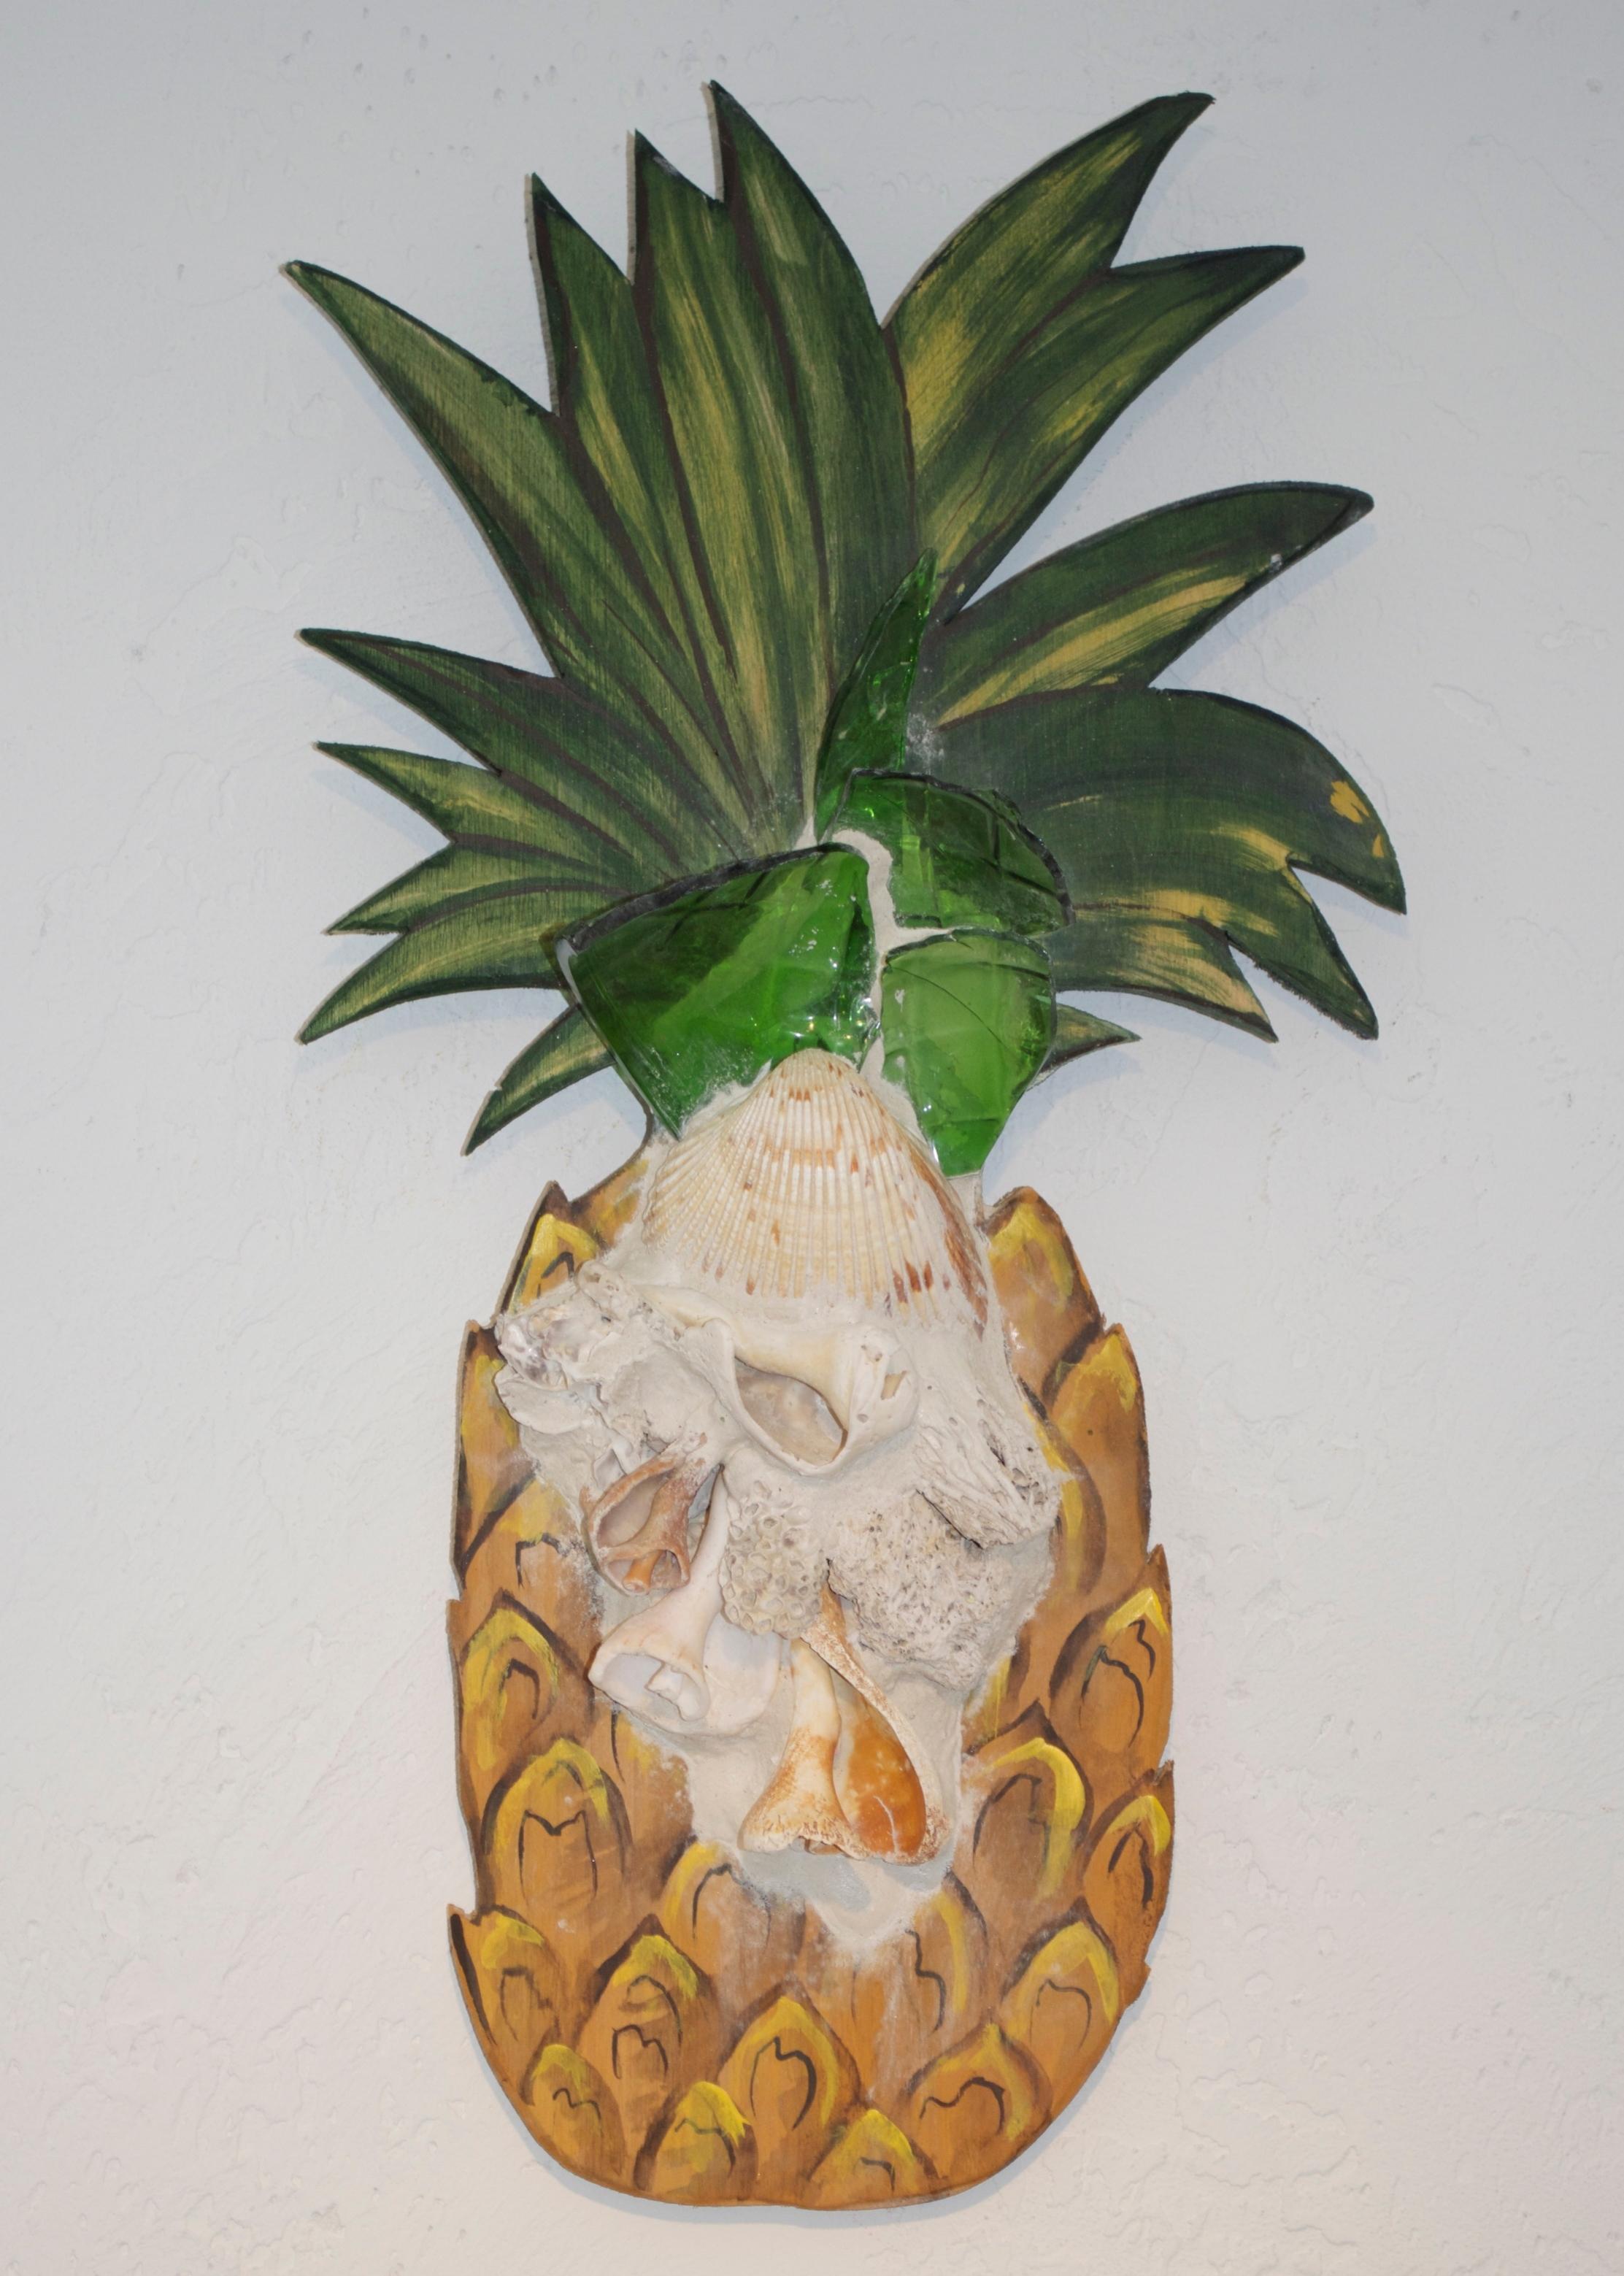 "Beach Art - Pineapple - wood, glass, shells - sm. 6"" x 11"", $44, large 9"" x 21"", $75"